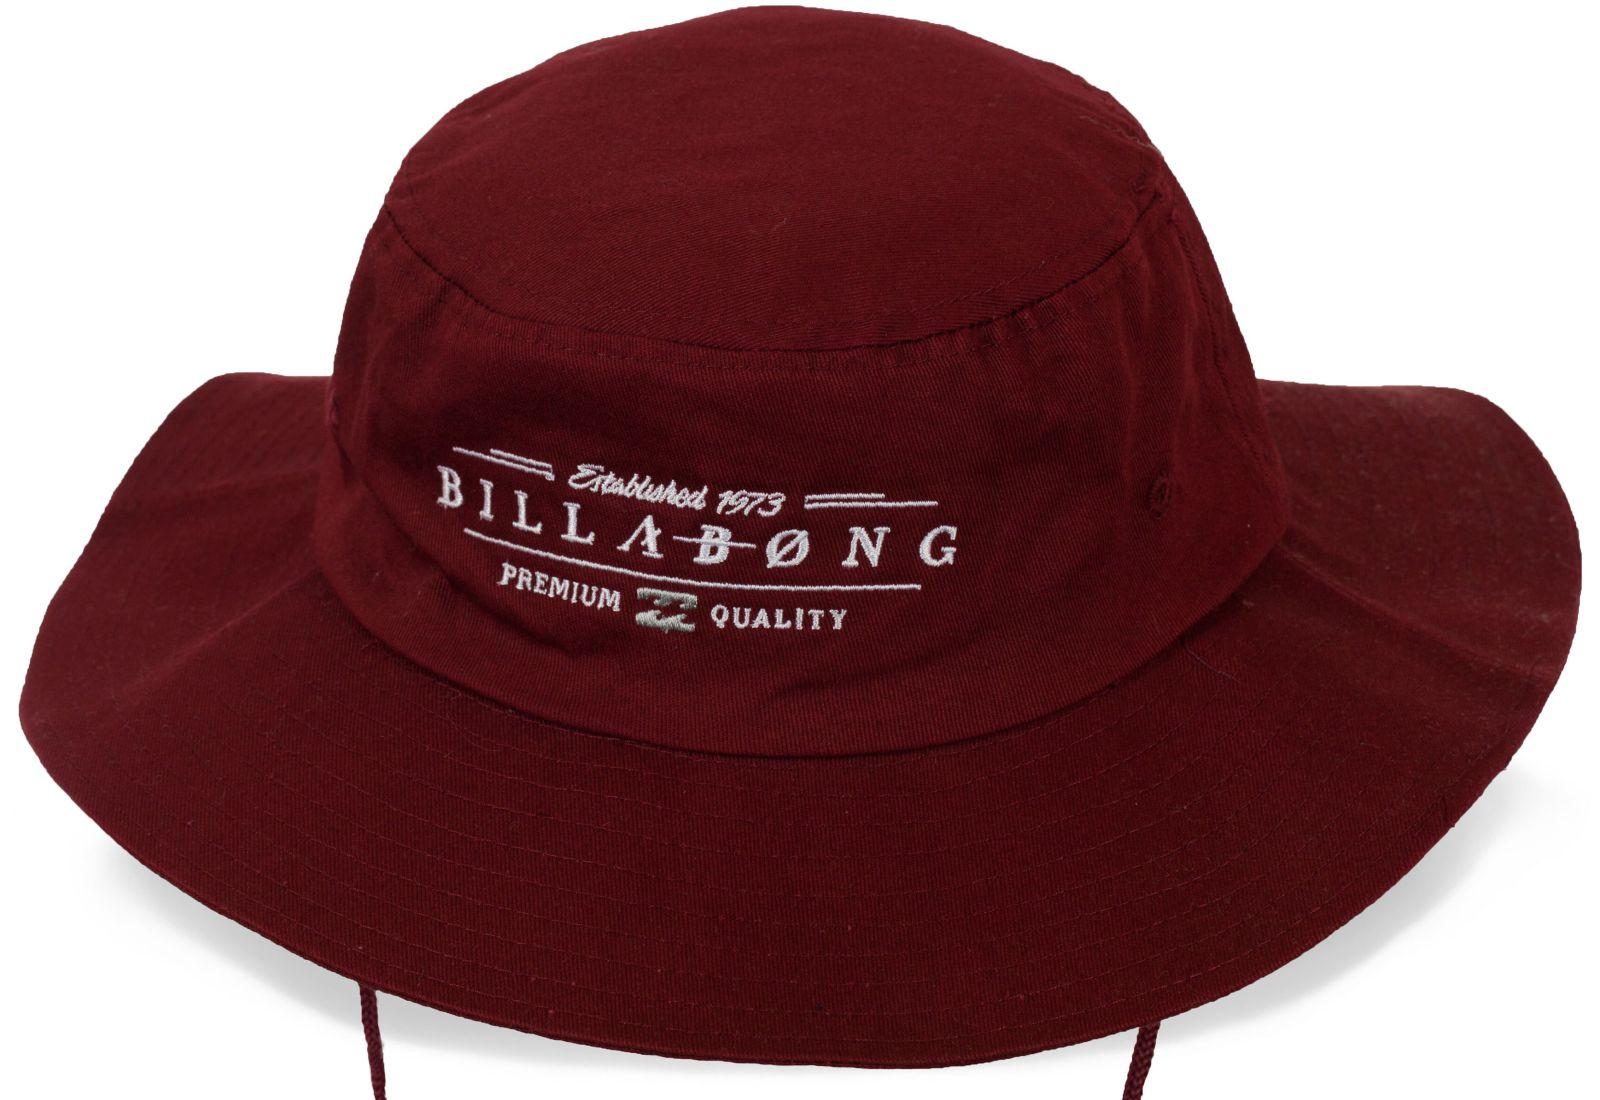 Яркая шляпа для яхтинга Billabong